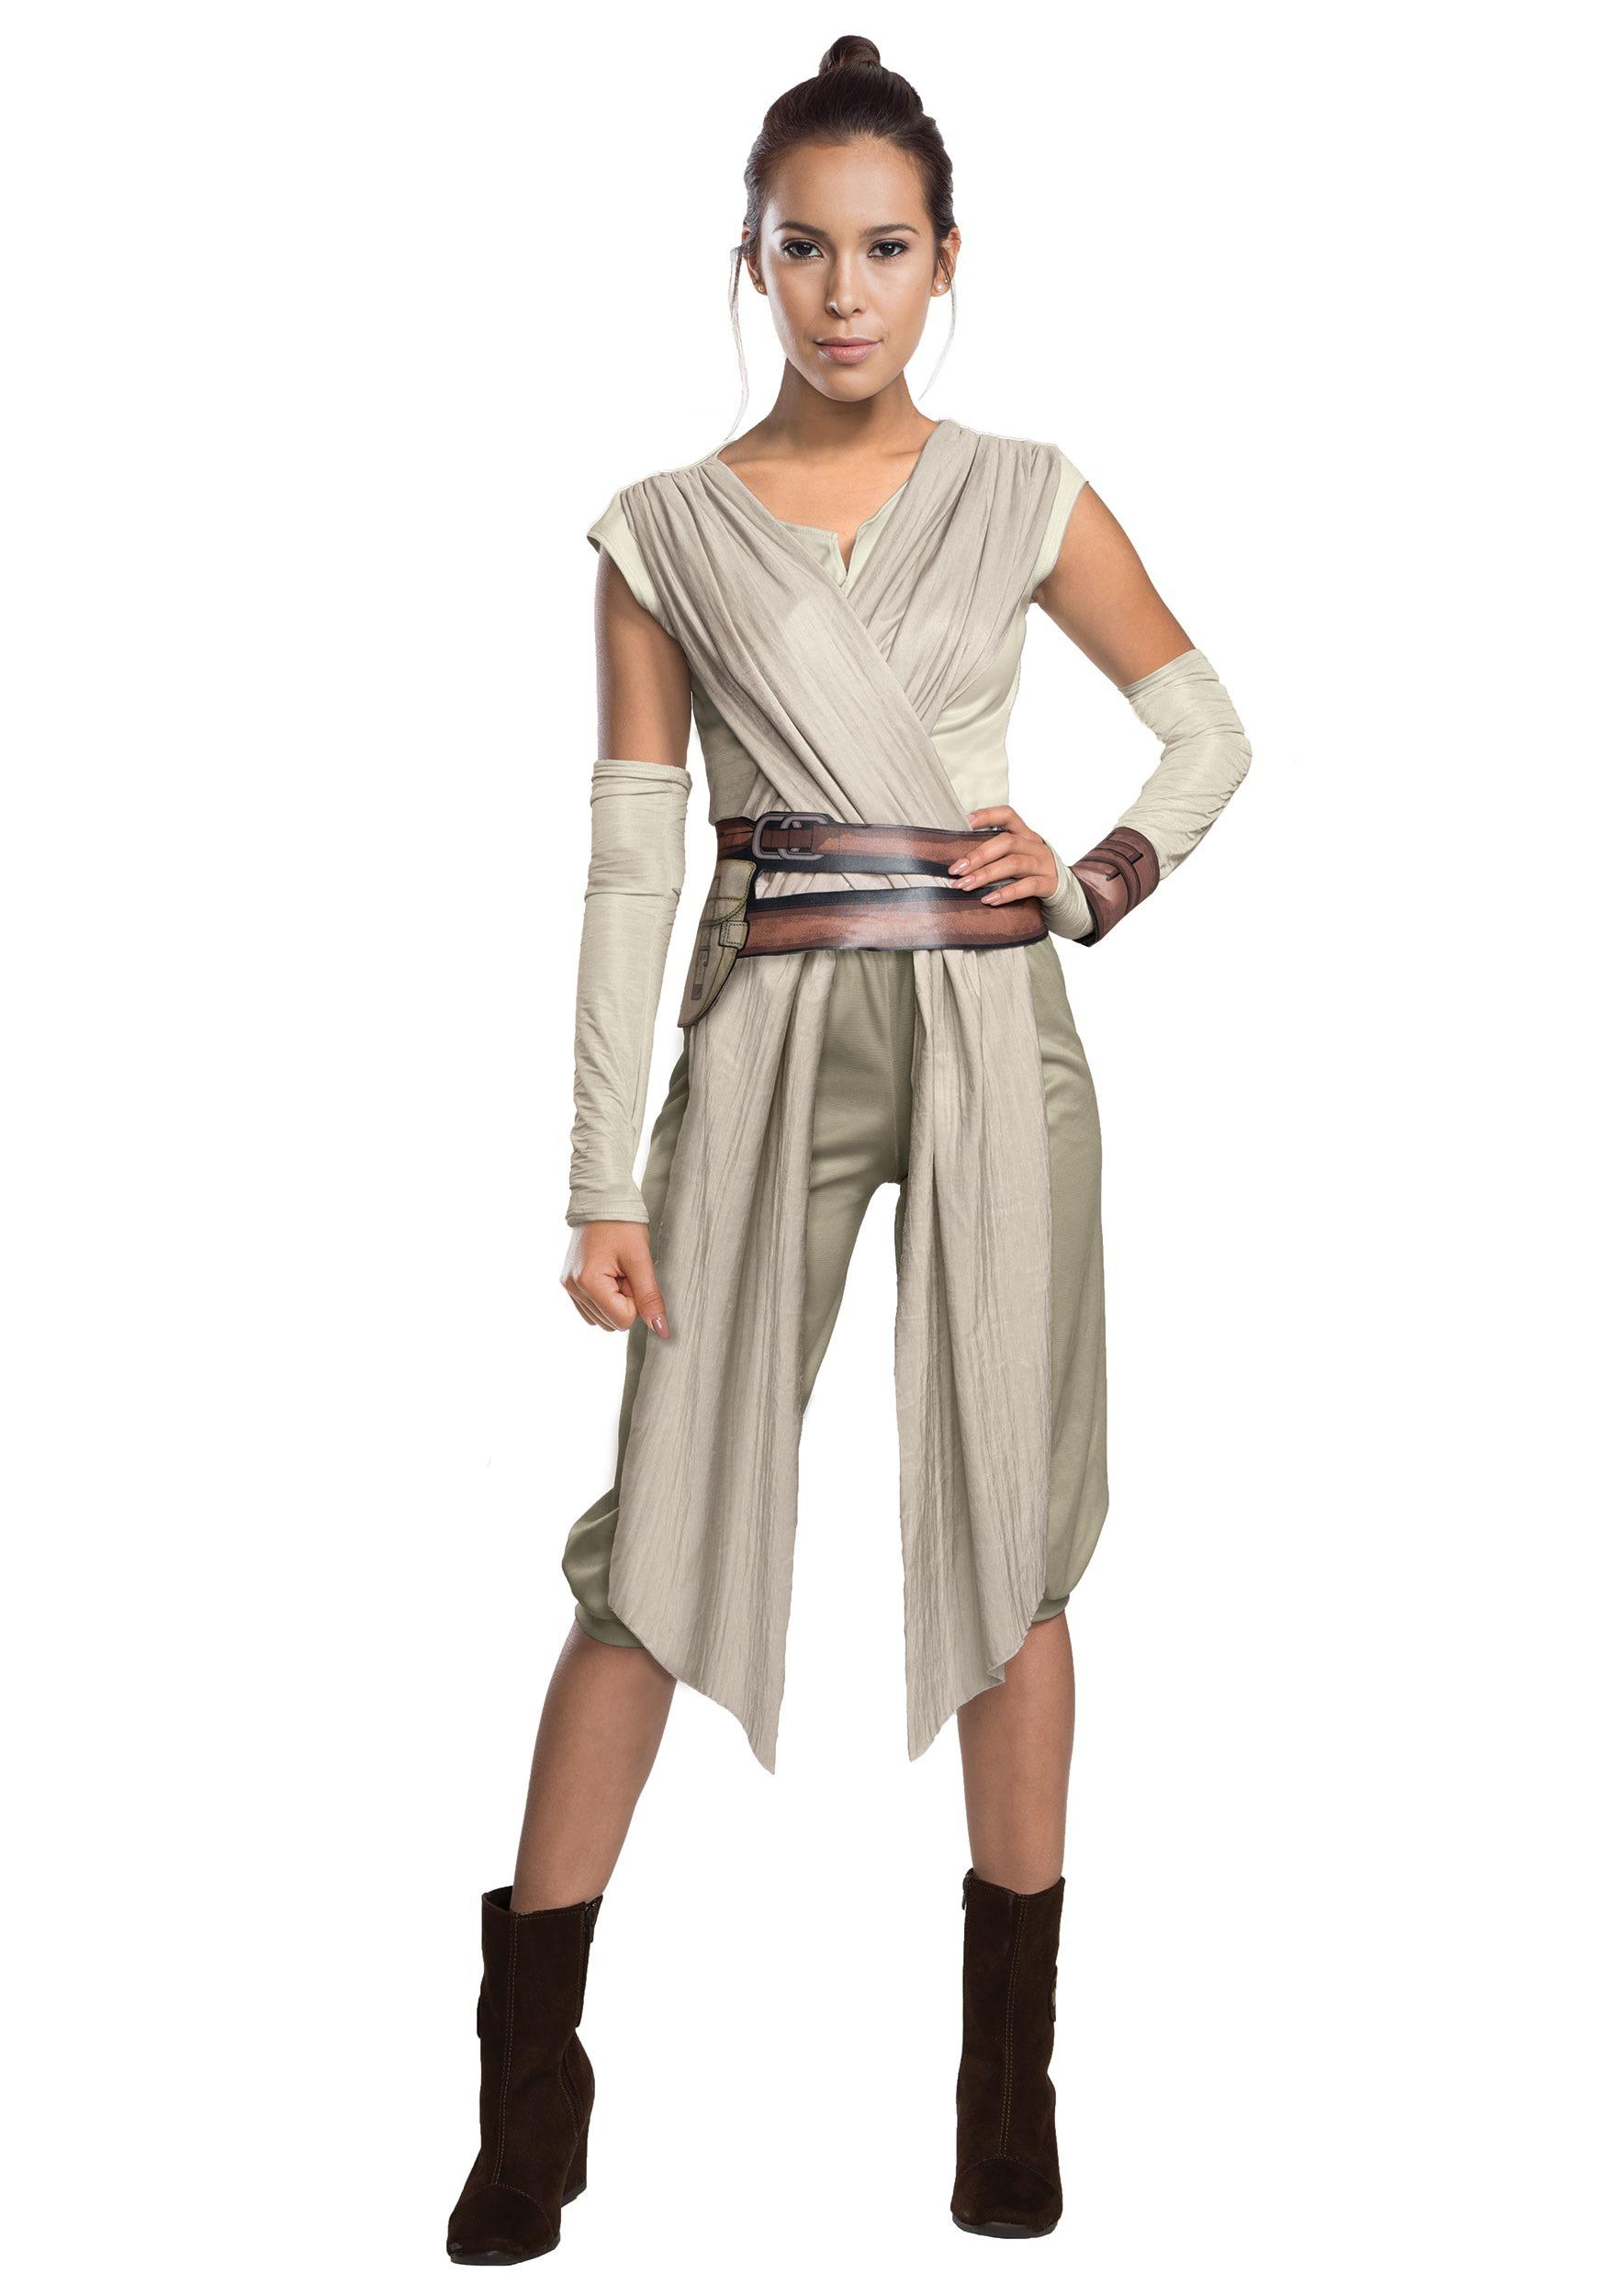 Star Wars Costumes - Adult, Child, Kids Halloween Costume